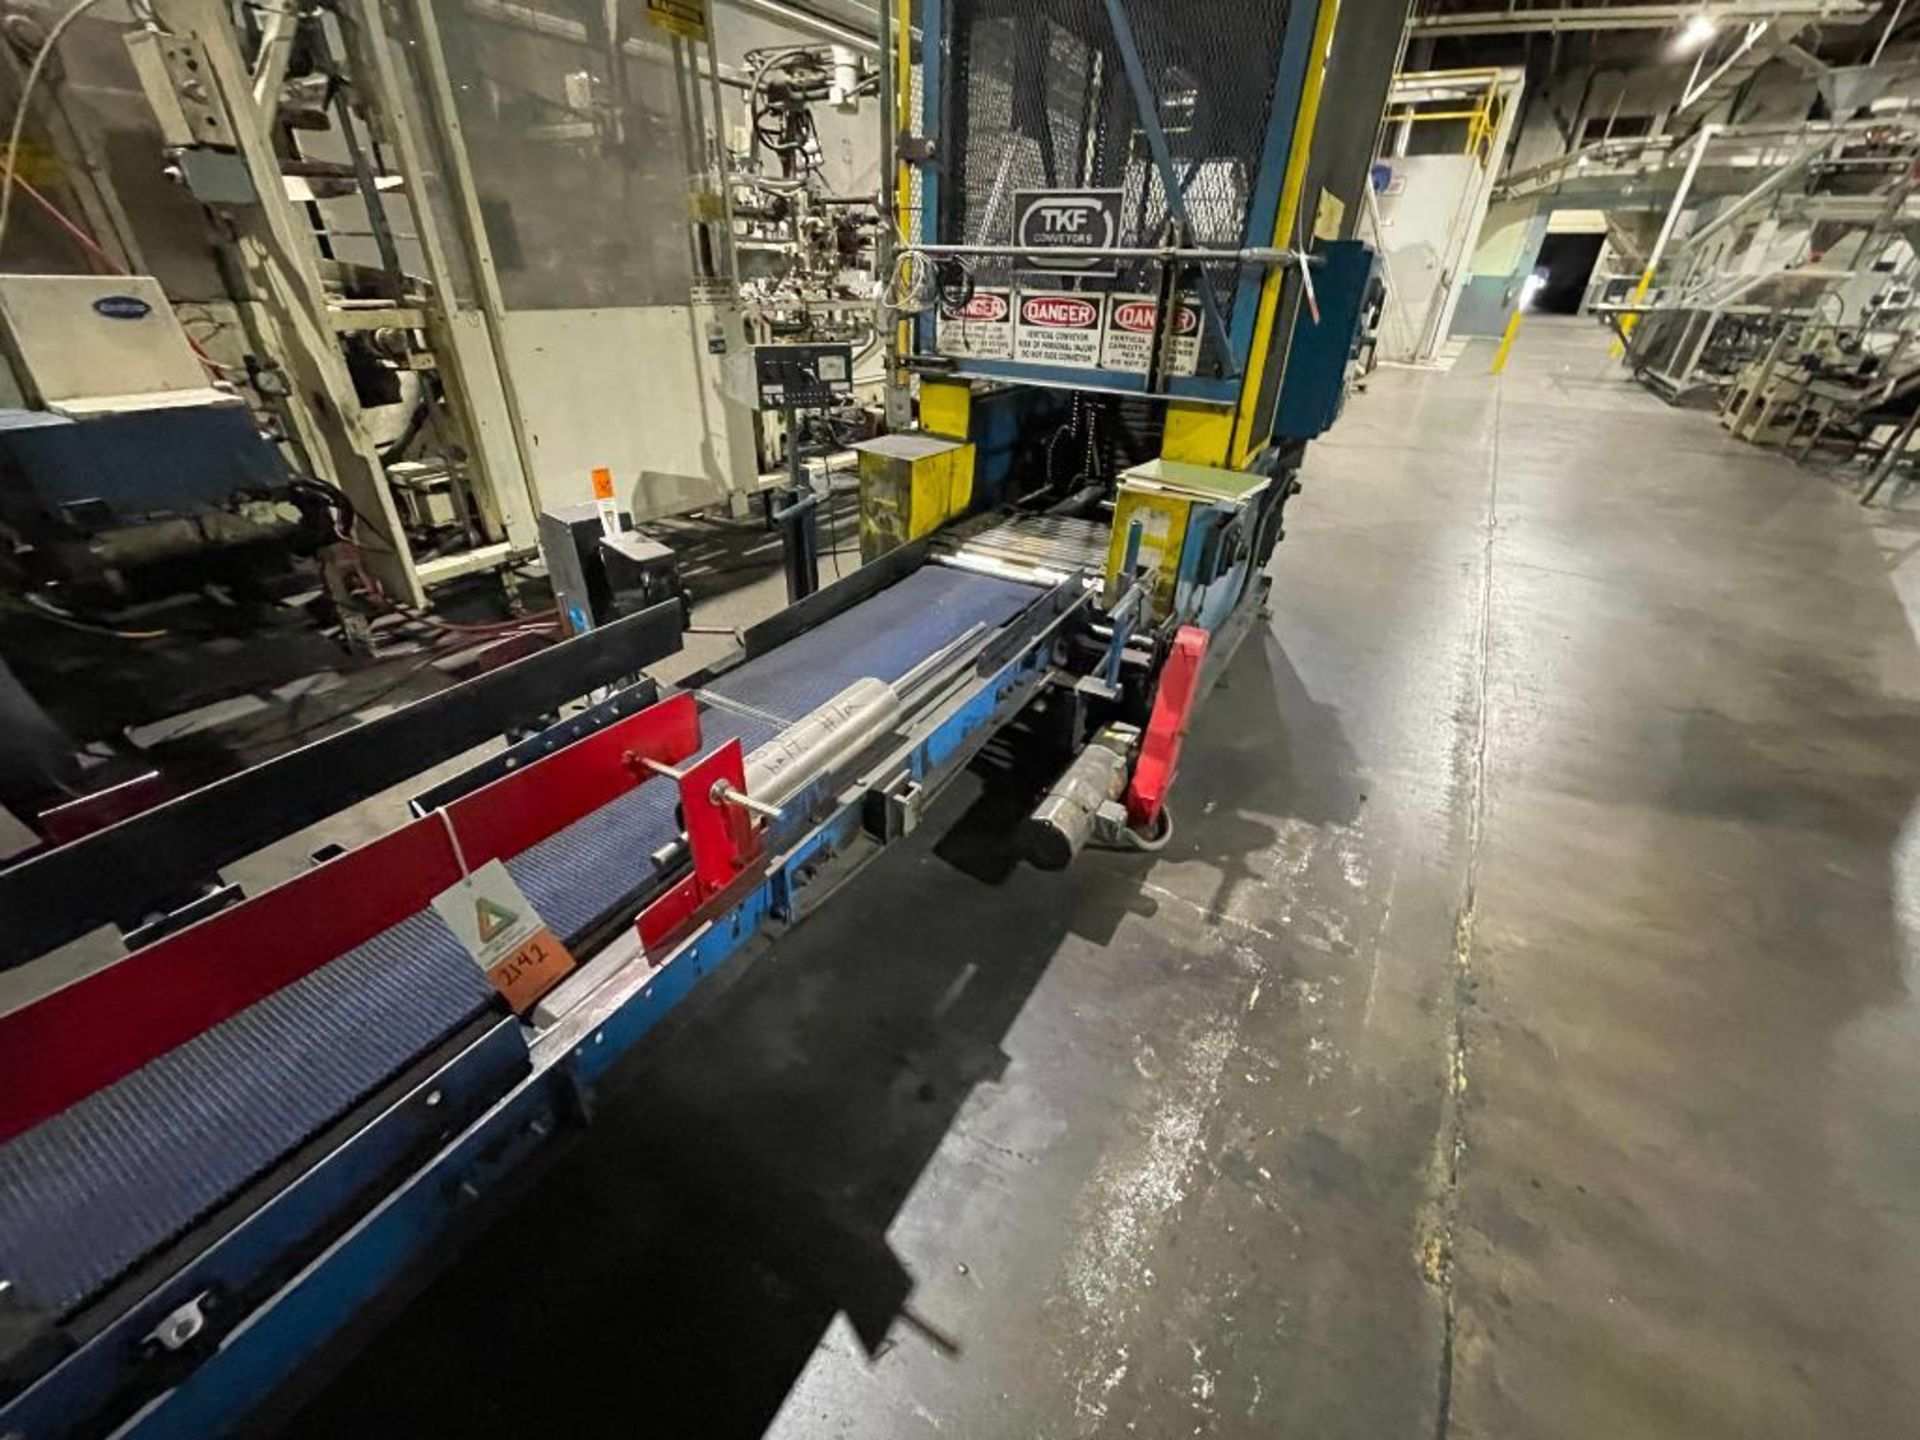 mild steel conveyor - Image 5 of 11